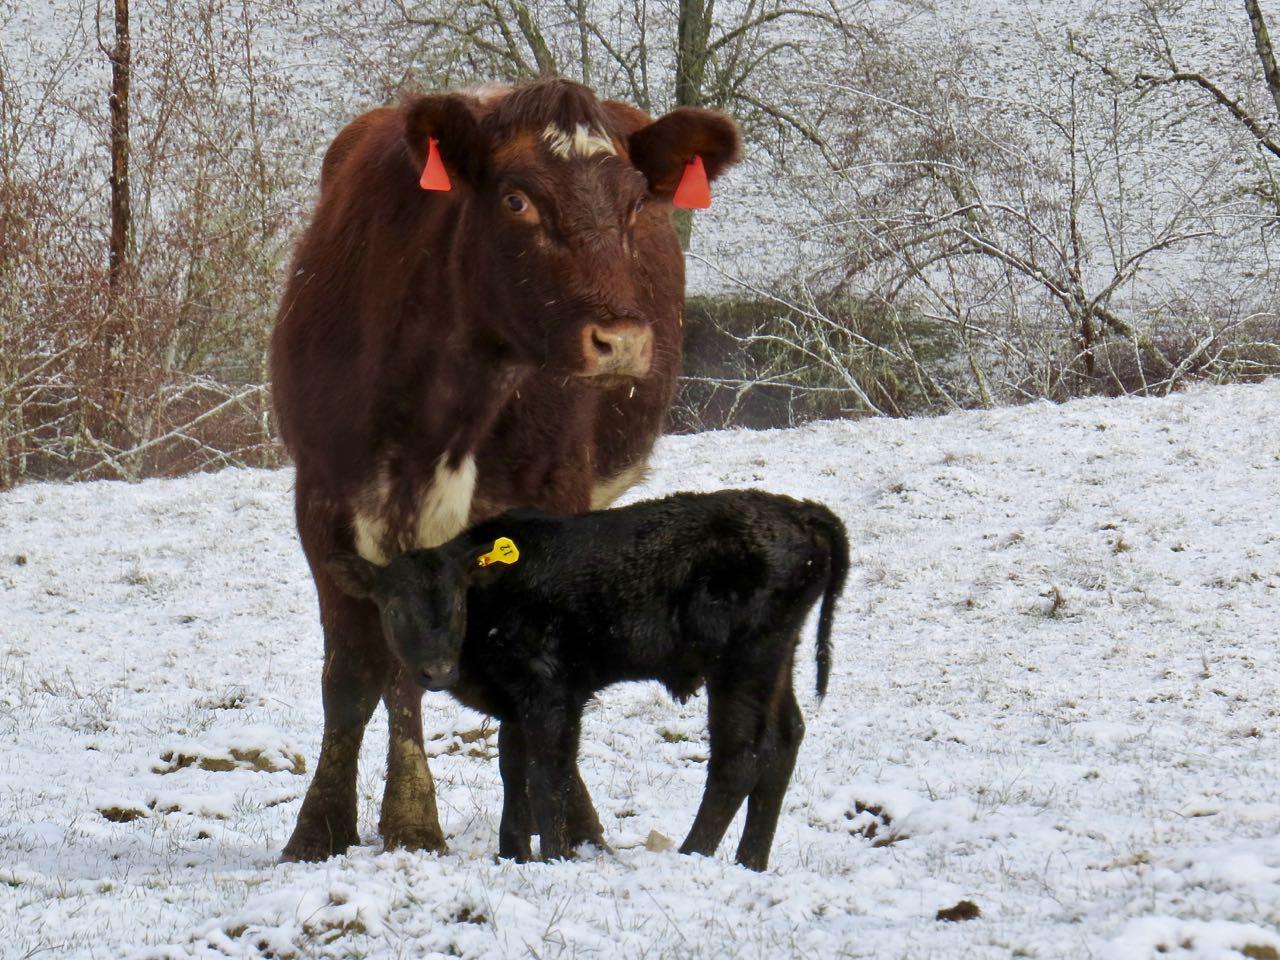 LuAnn Kessi: Baby Calves....in the SNOW